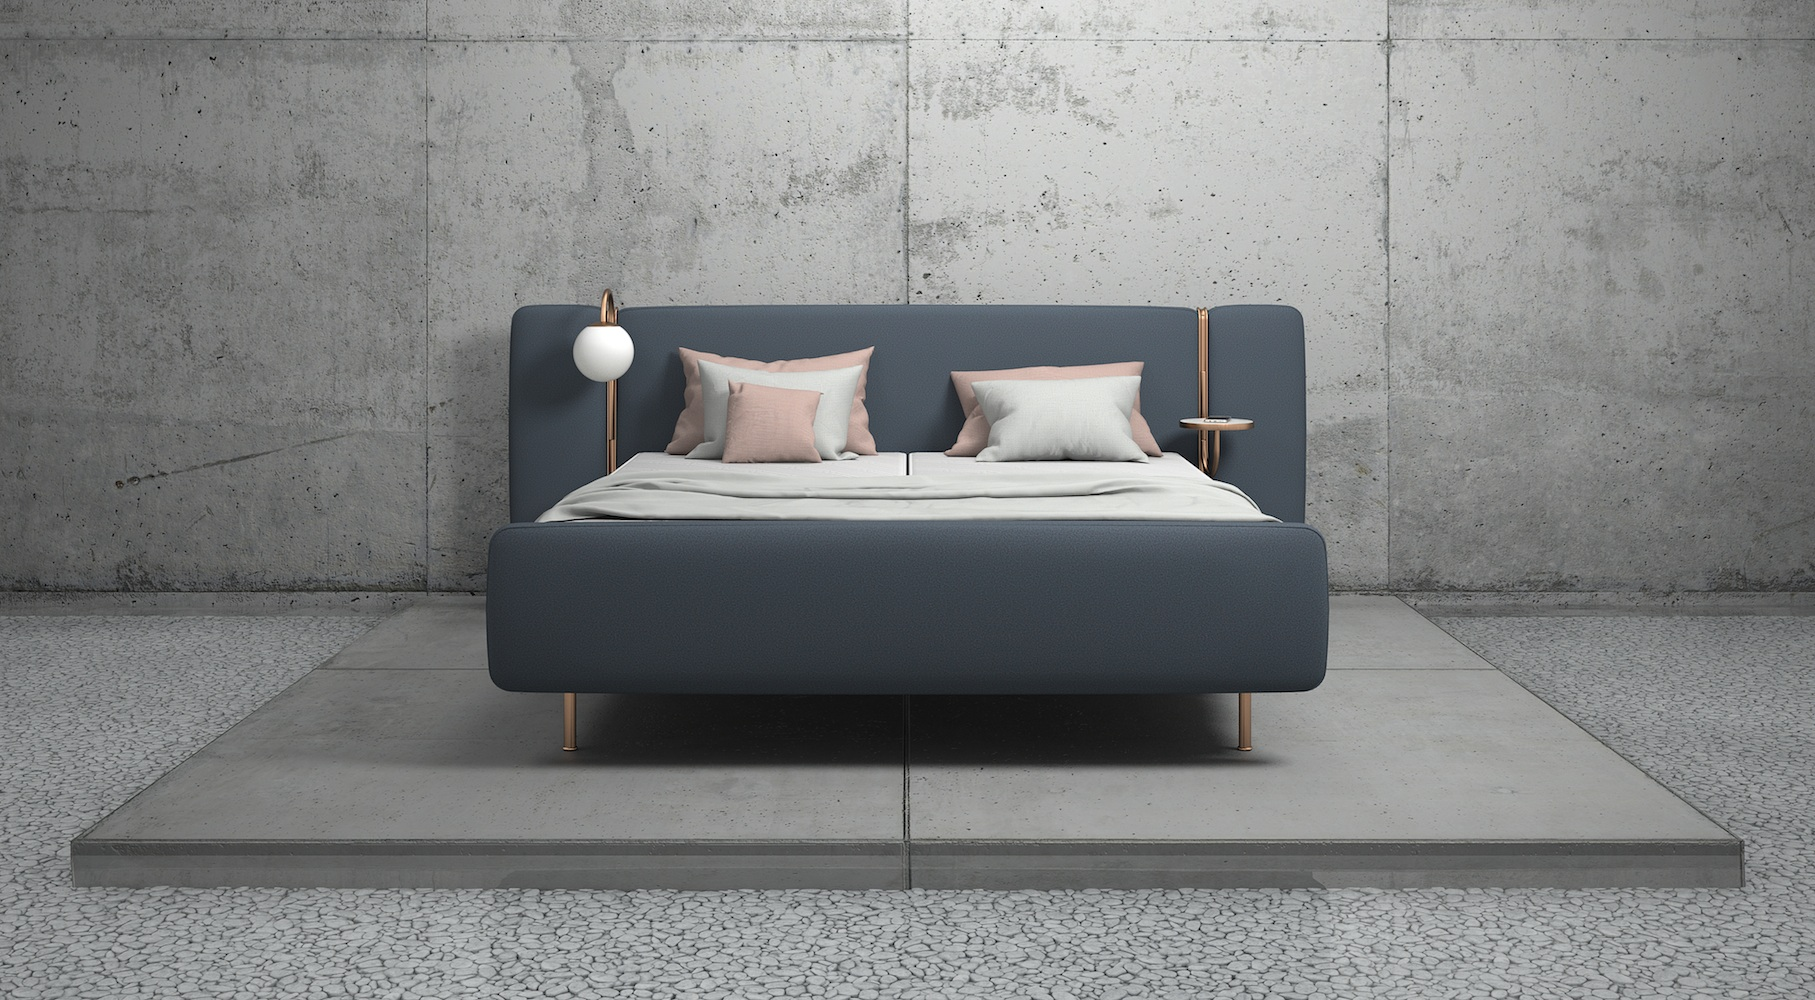 Tête de lit. Lit en tissu. Lit design. Elite beds